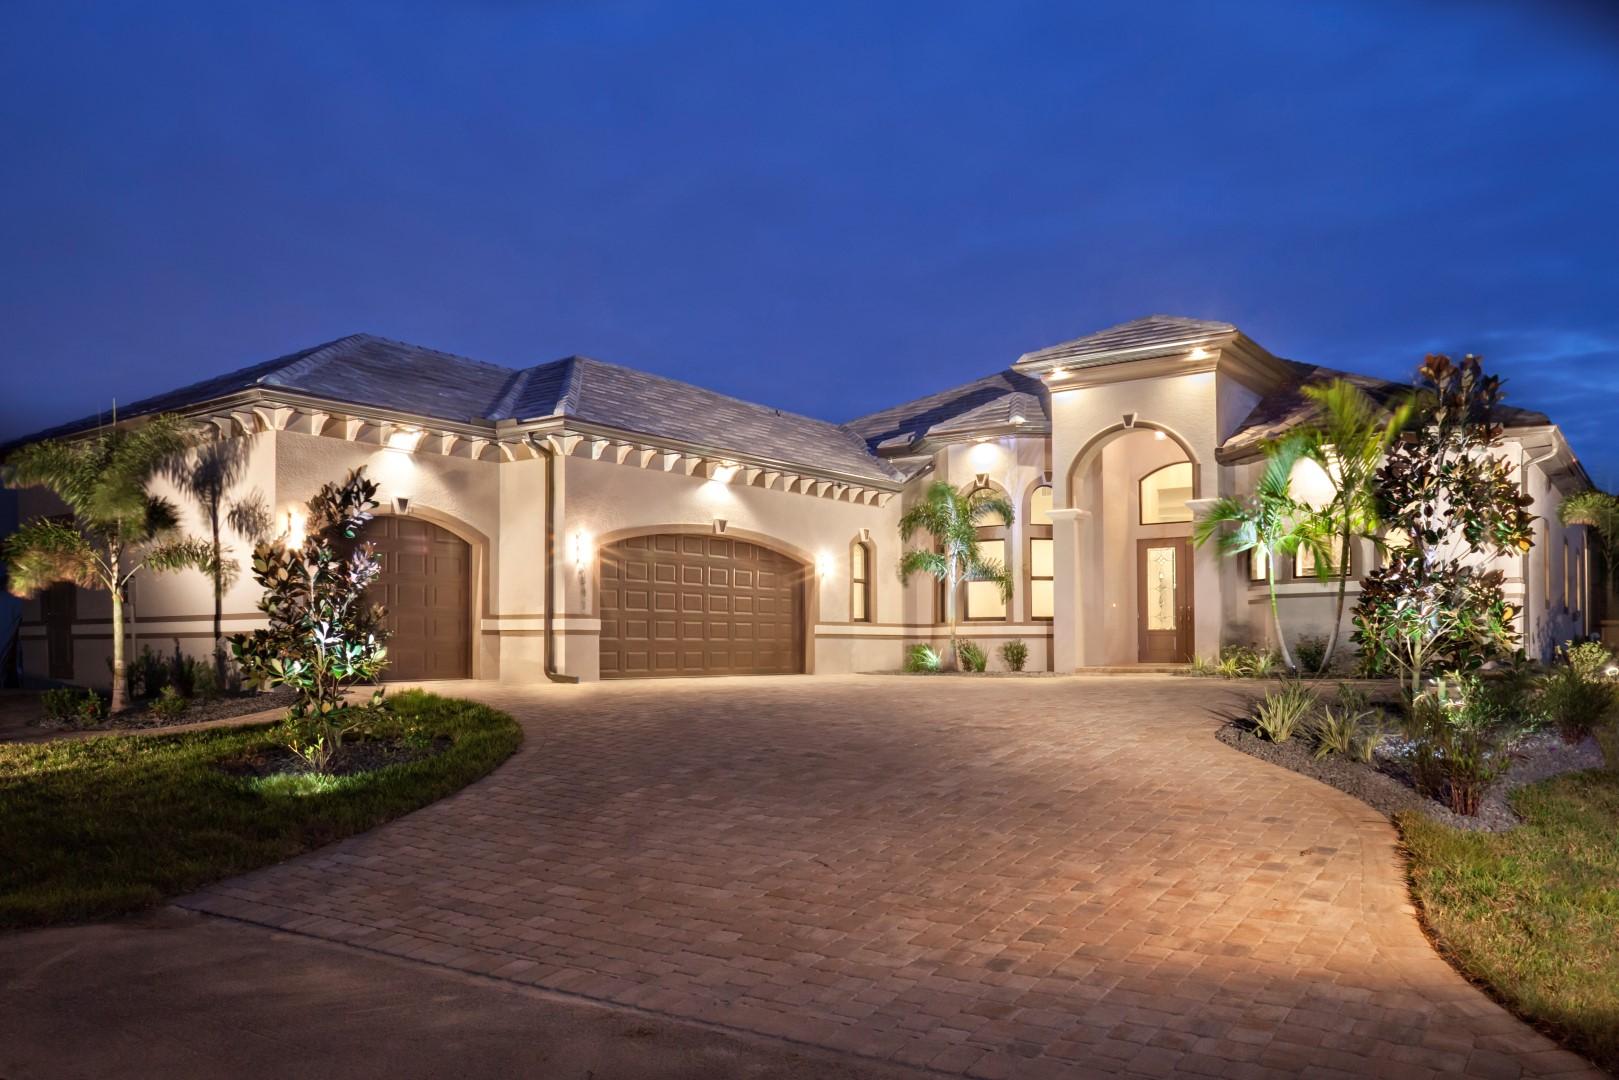 The trinidad 3194 sqft sinclair custom homes inc - House with a view ...